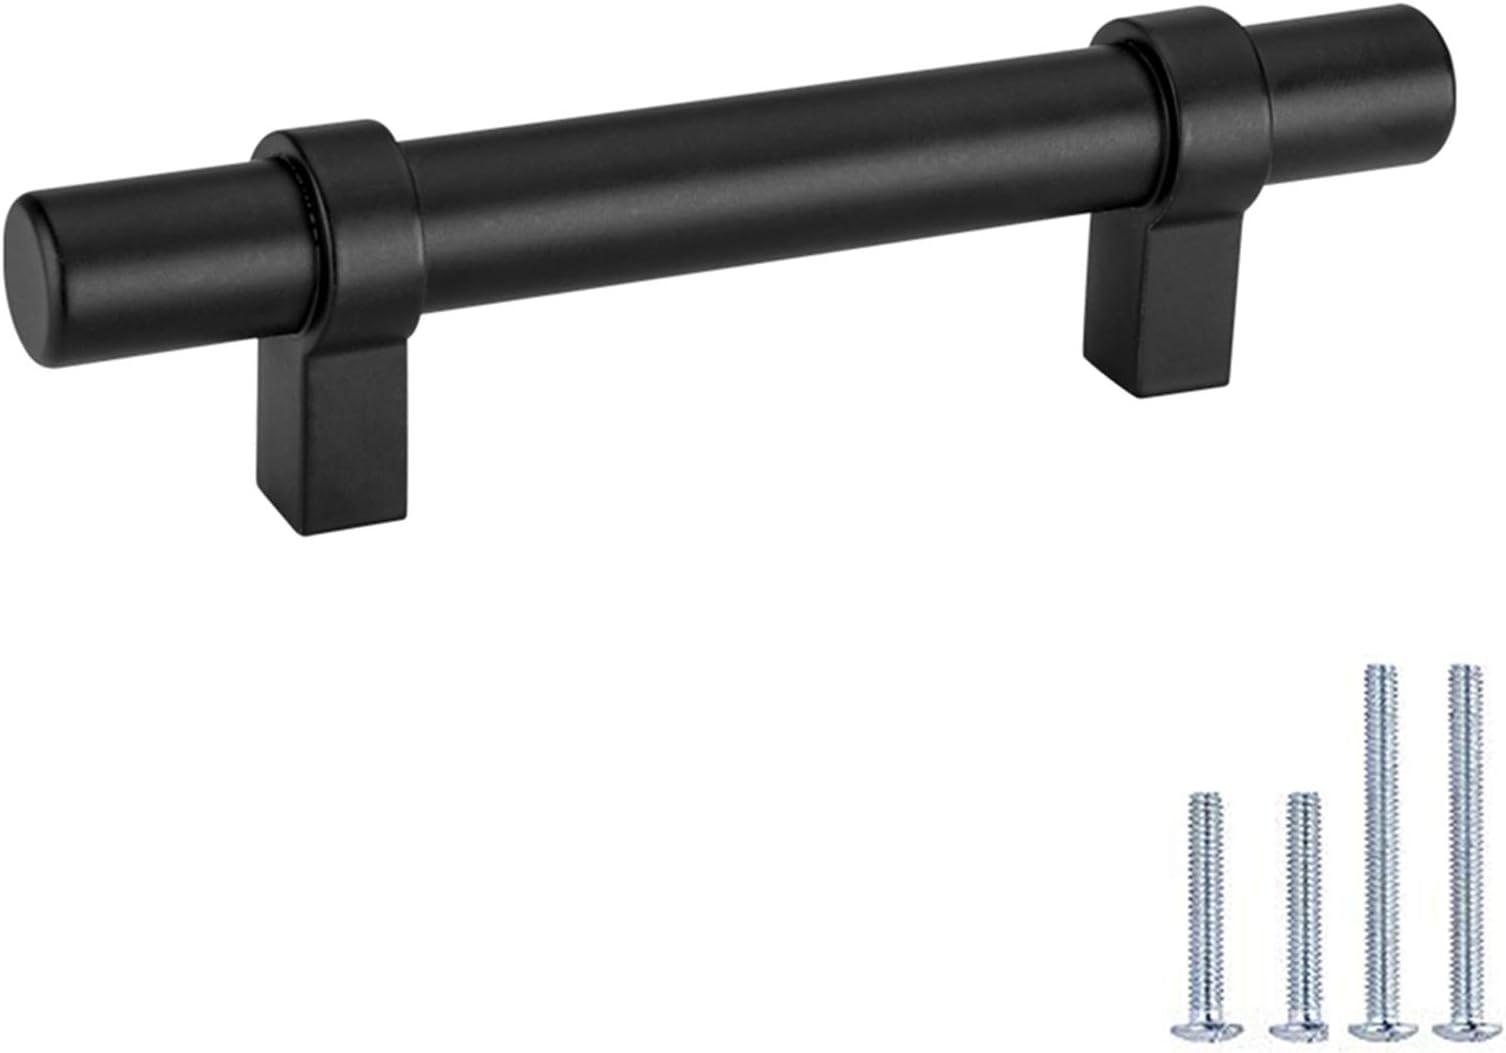 3.34 5/'/' 6.3/'/' Black Beech Cabinet Pull Knob Brushed Steel Matte Aluminum Cabinet Handles Dresser Drawer Pull Handles Bar 96 128 160mm